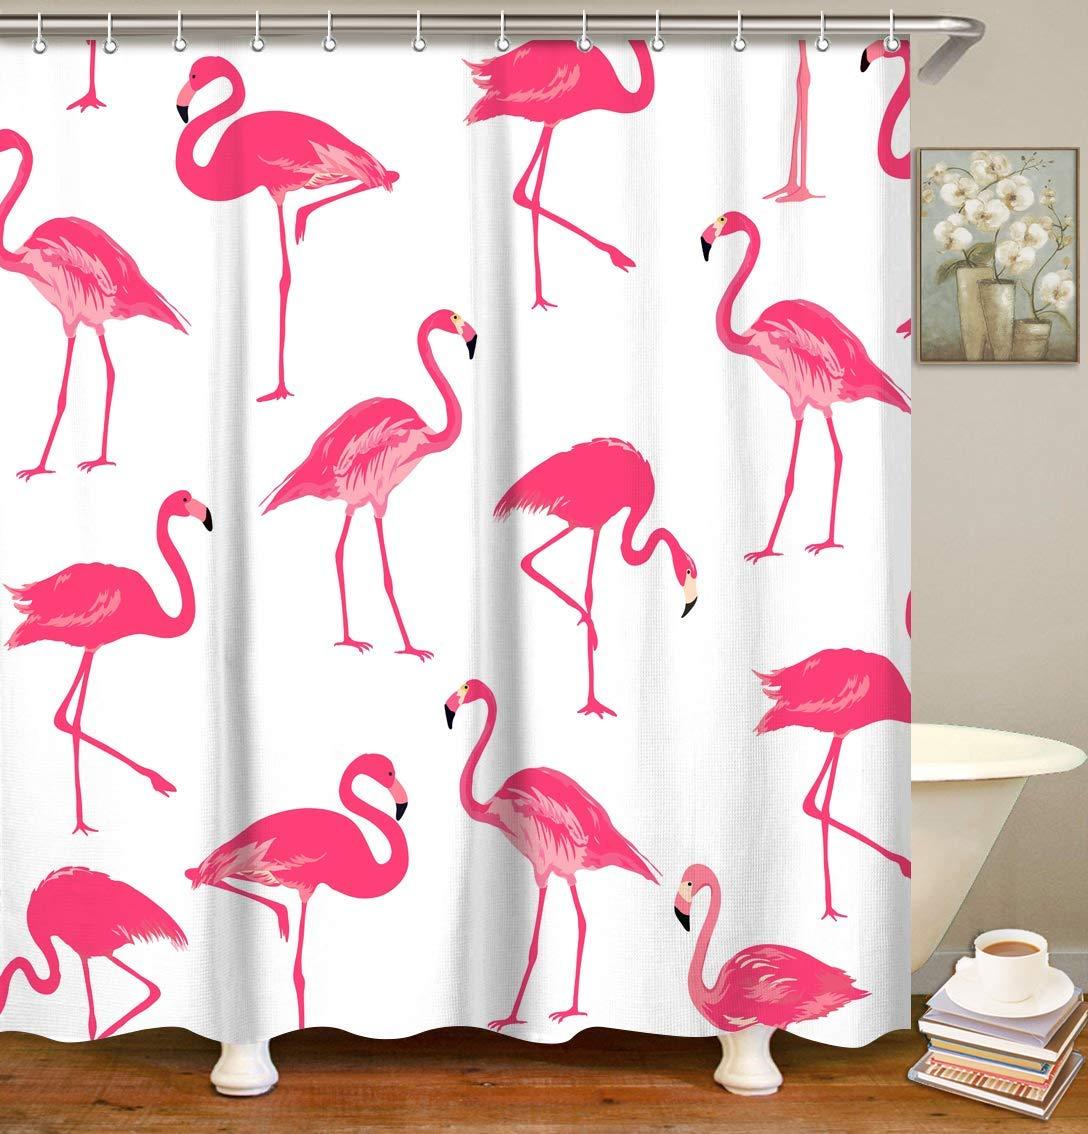 Pink Flamingo Bathroom Decor.Livilan Fabric Flamingo Shower Curtain Set With 12 Hooks Pink Flamingo Bathroom Decor Durable Bath Curtains 70 8 X 70 8 White And Pink Home Decor